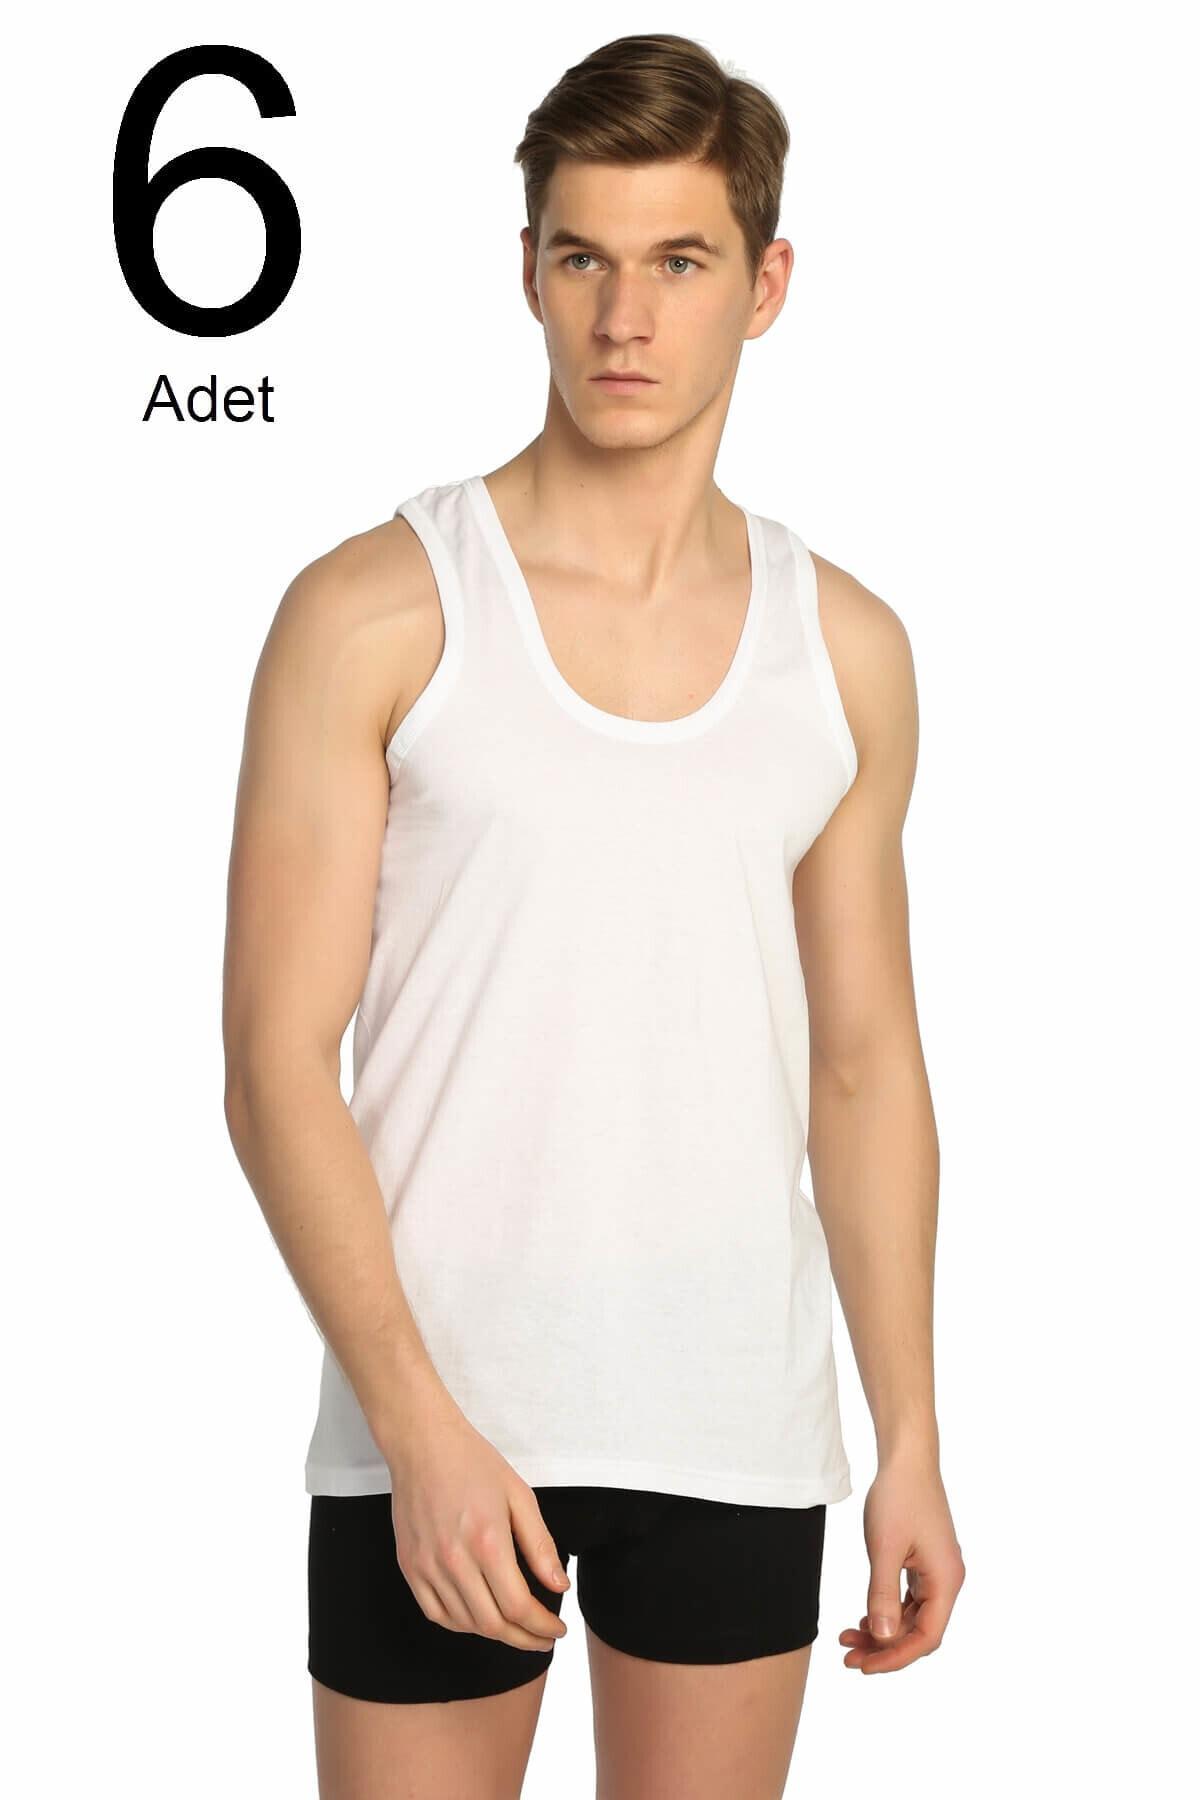 Tutku Erkek Beyaz 6'lı Paket Klasik Atlet Elf568t0101ccm6 1